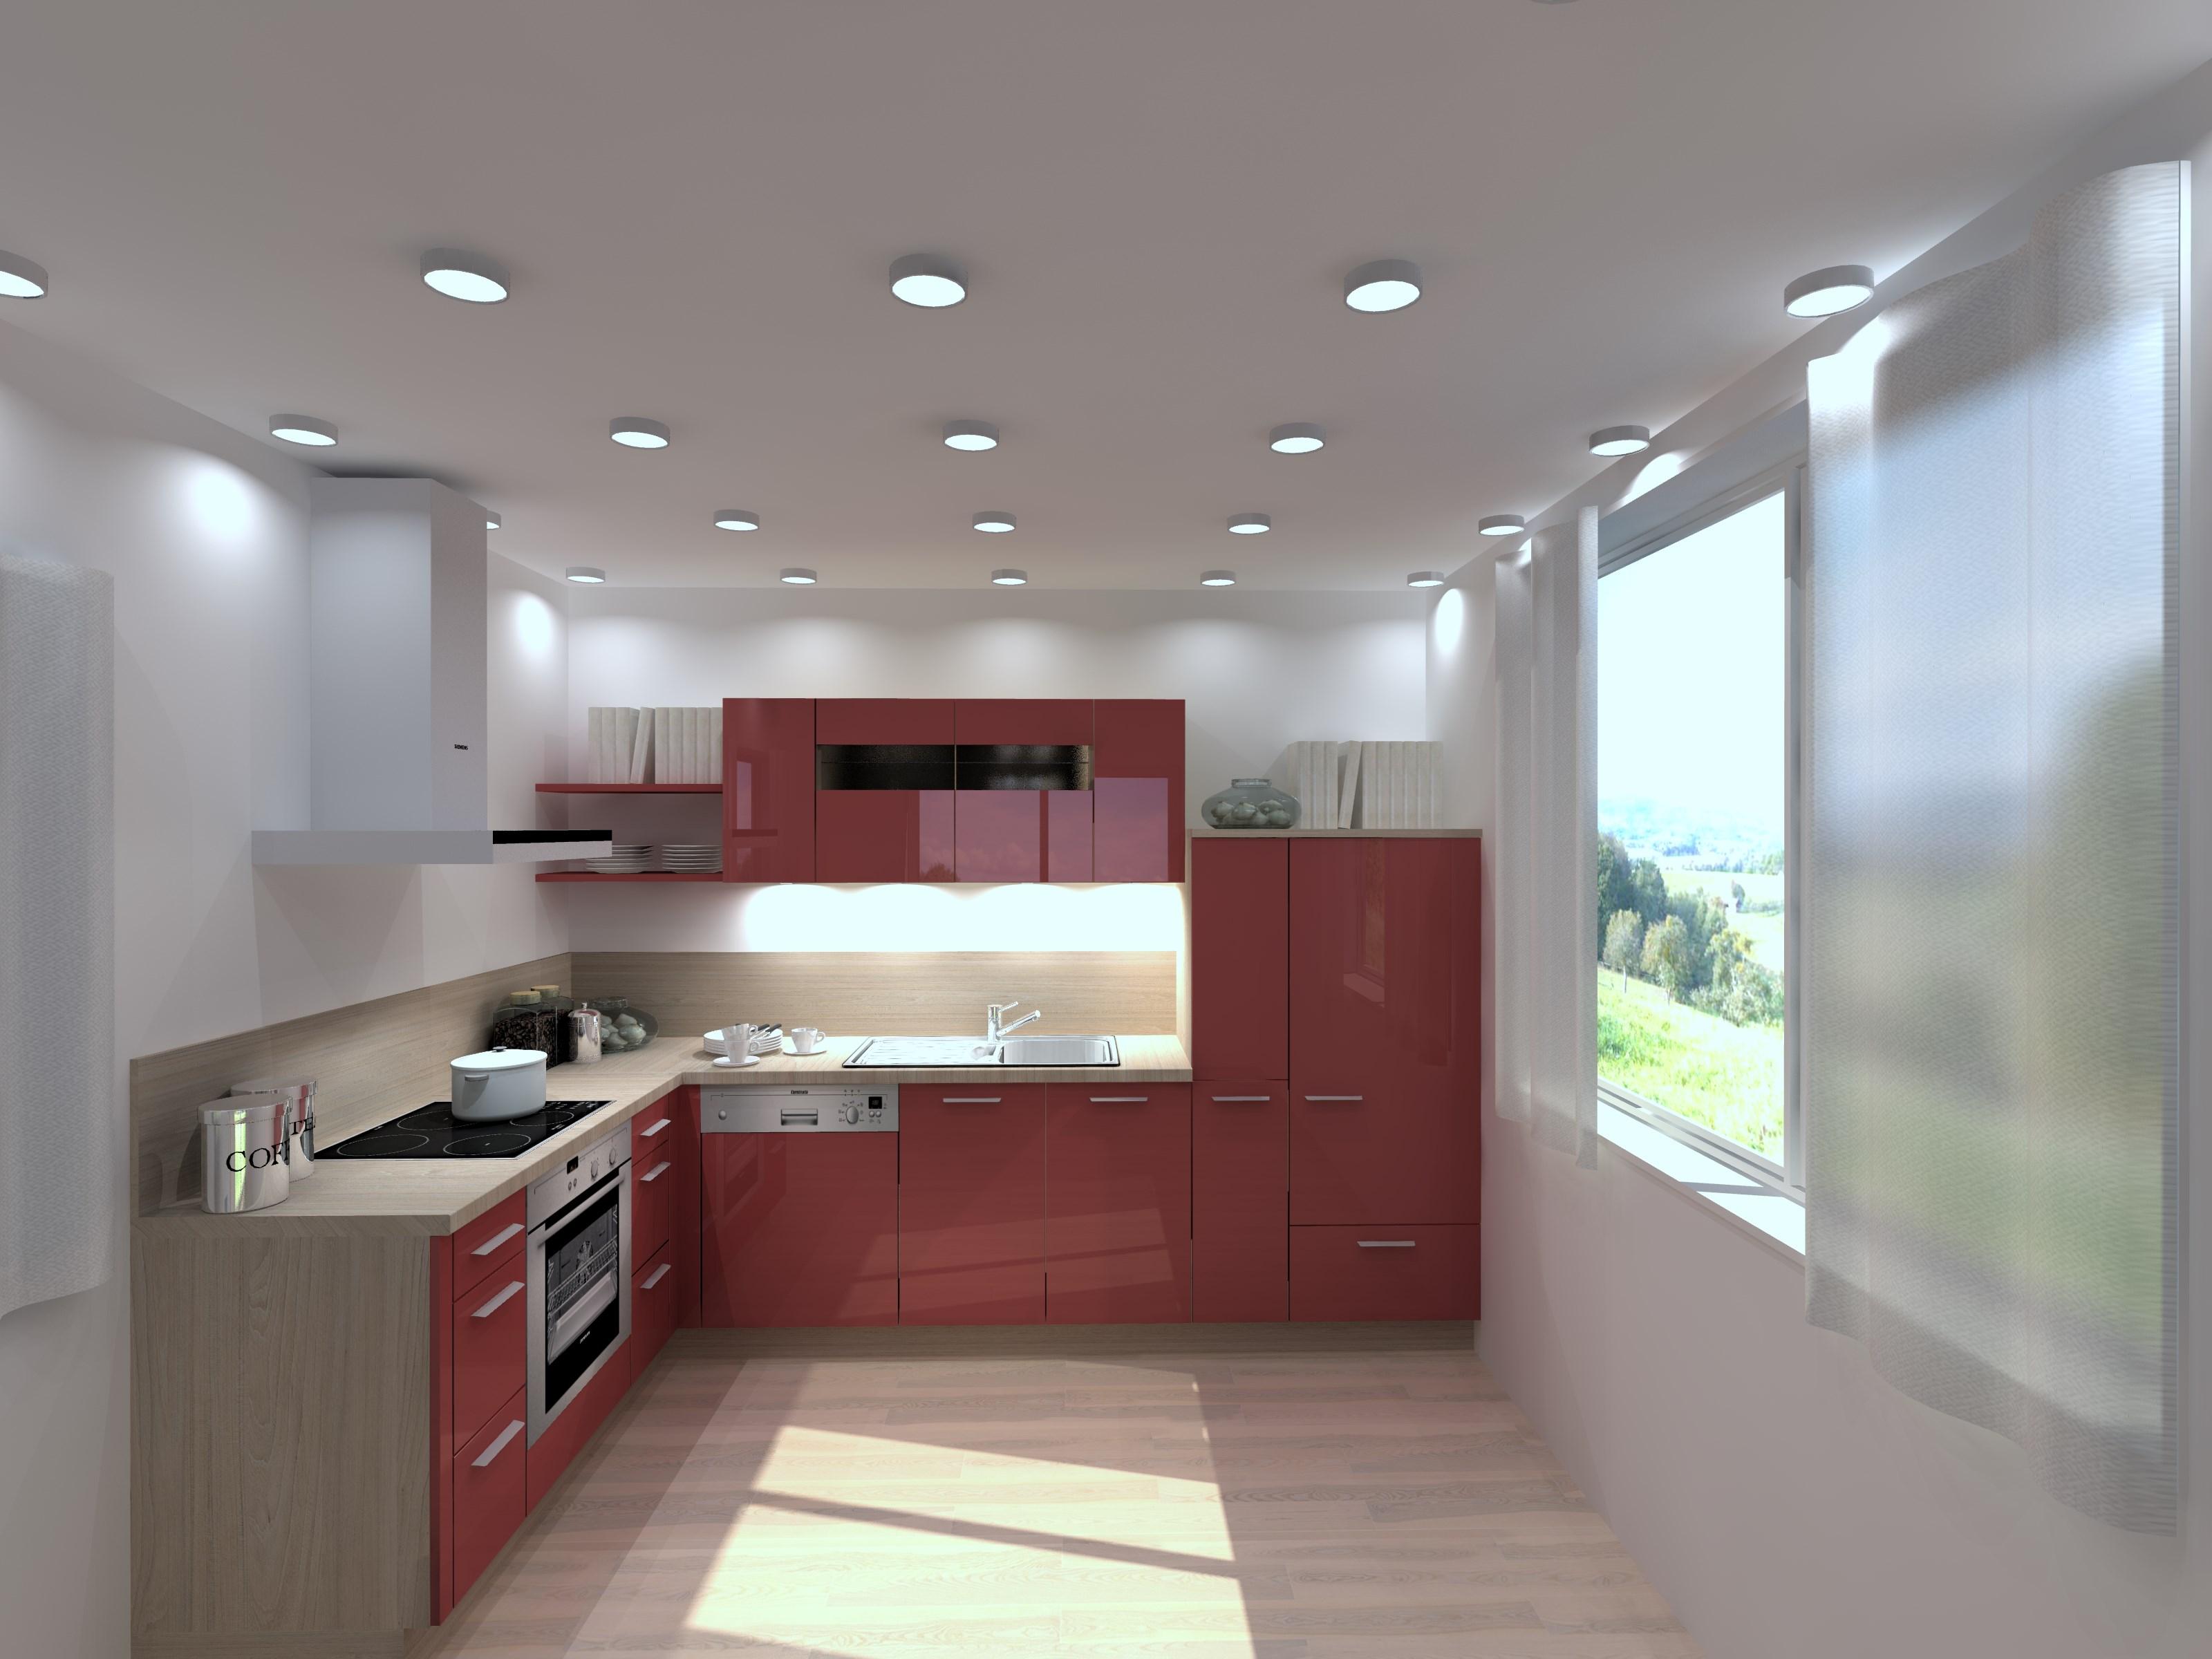 Buc t rii pline de culoare trend lack rosso - Nolte home studio ...